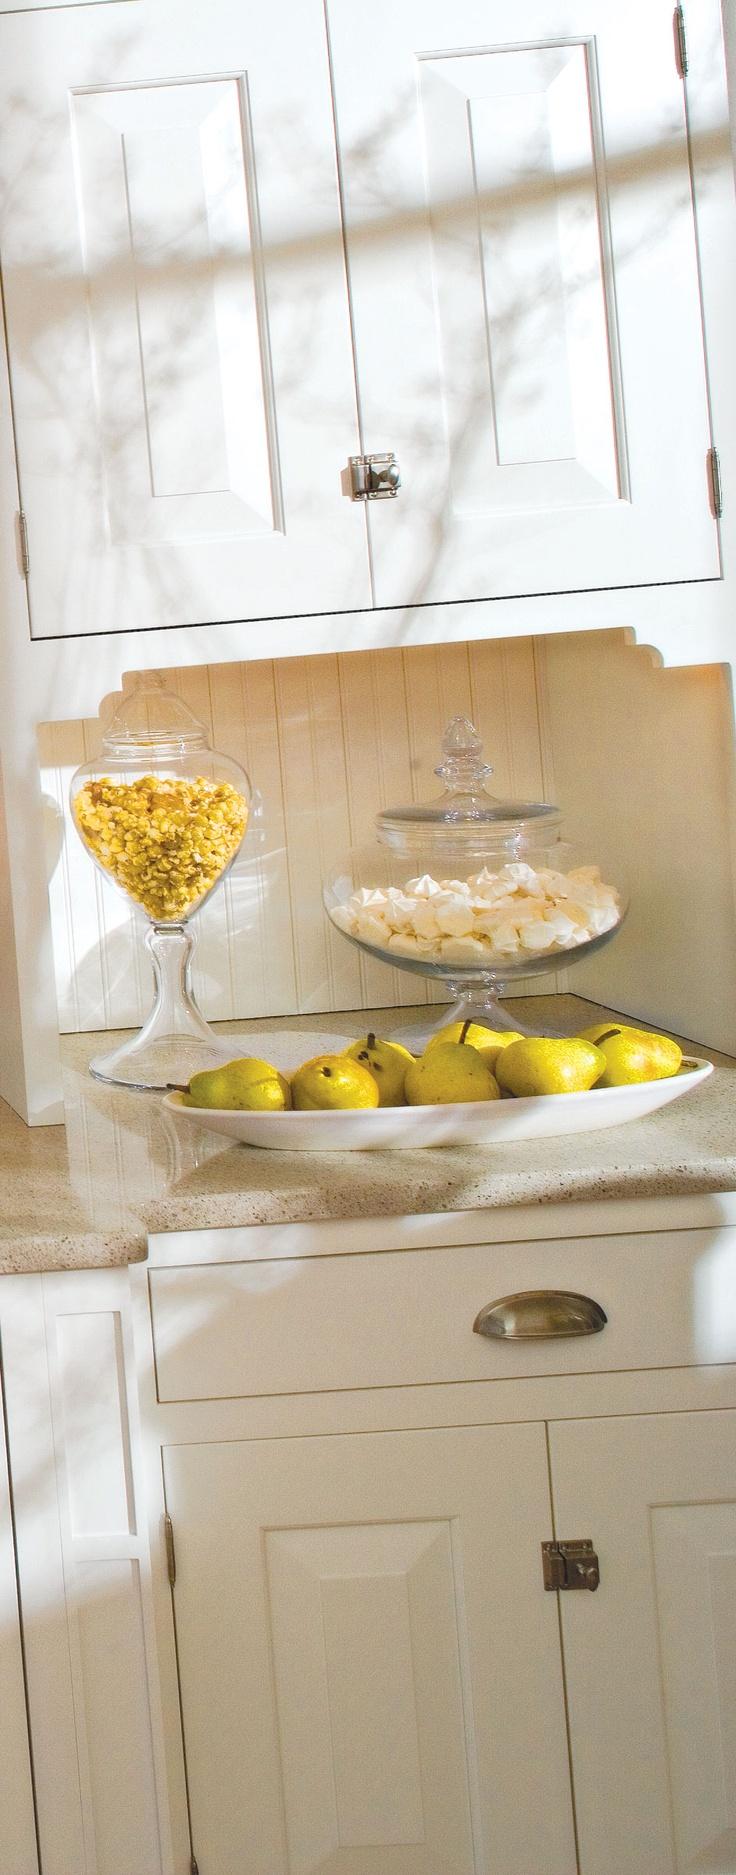 143 best images about kitchen remodel project on pinterest for Cottage style kitchen backsplash ideas